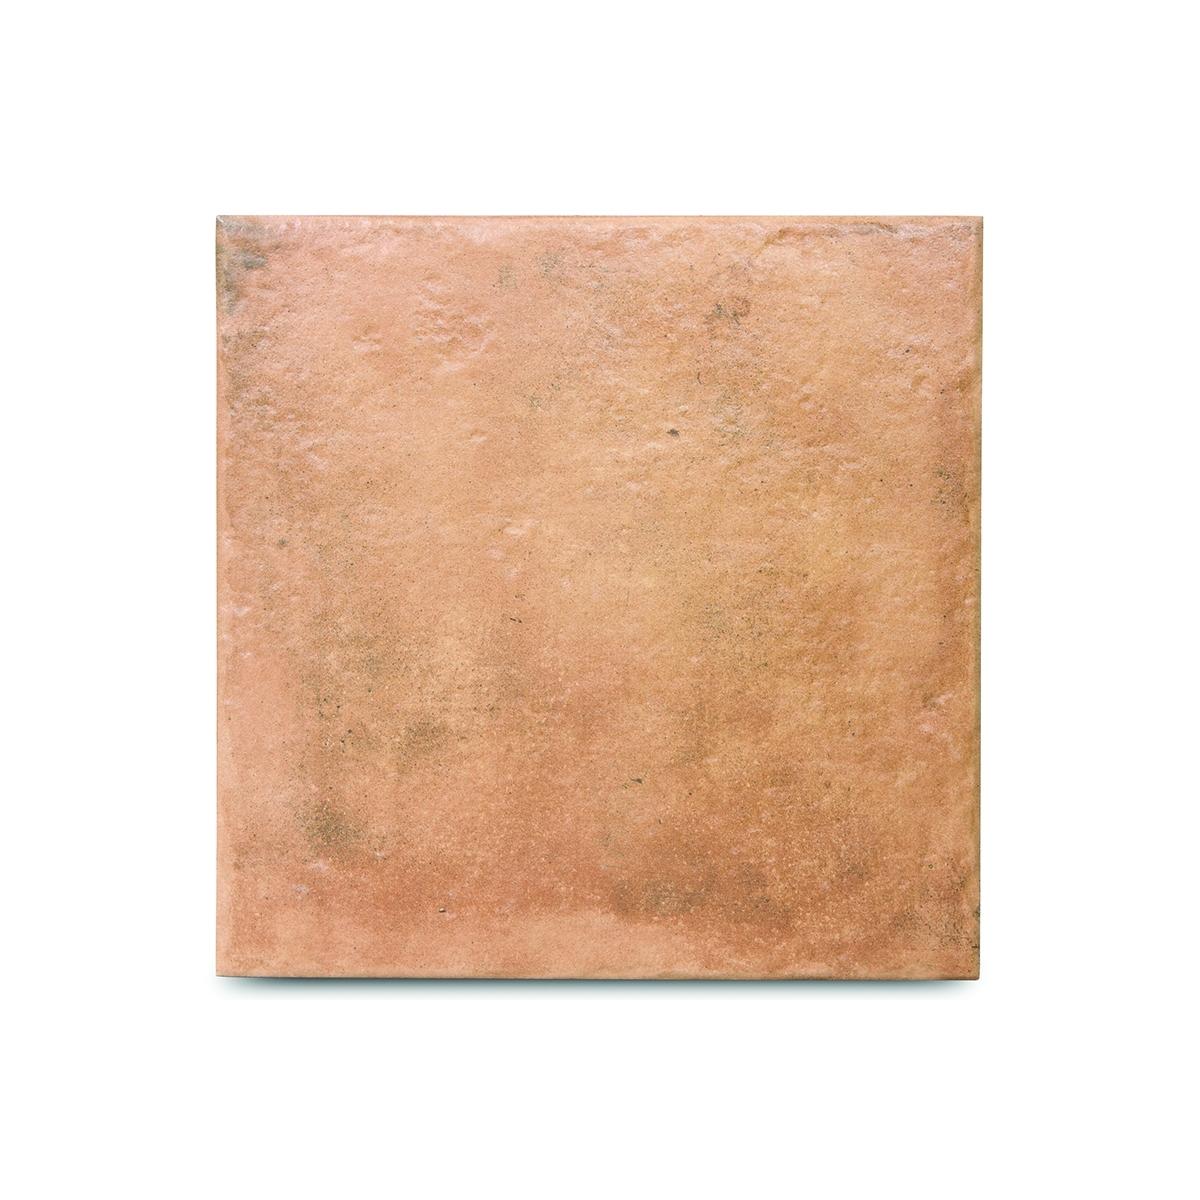 Andujar Terra 33.3x33.3 (caja de 1 m2)